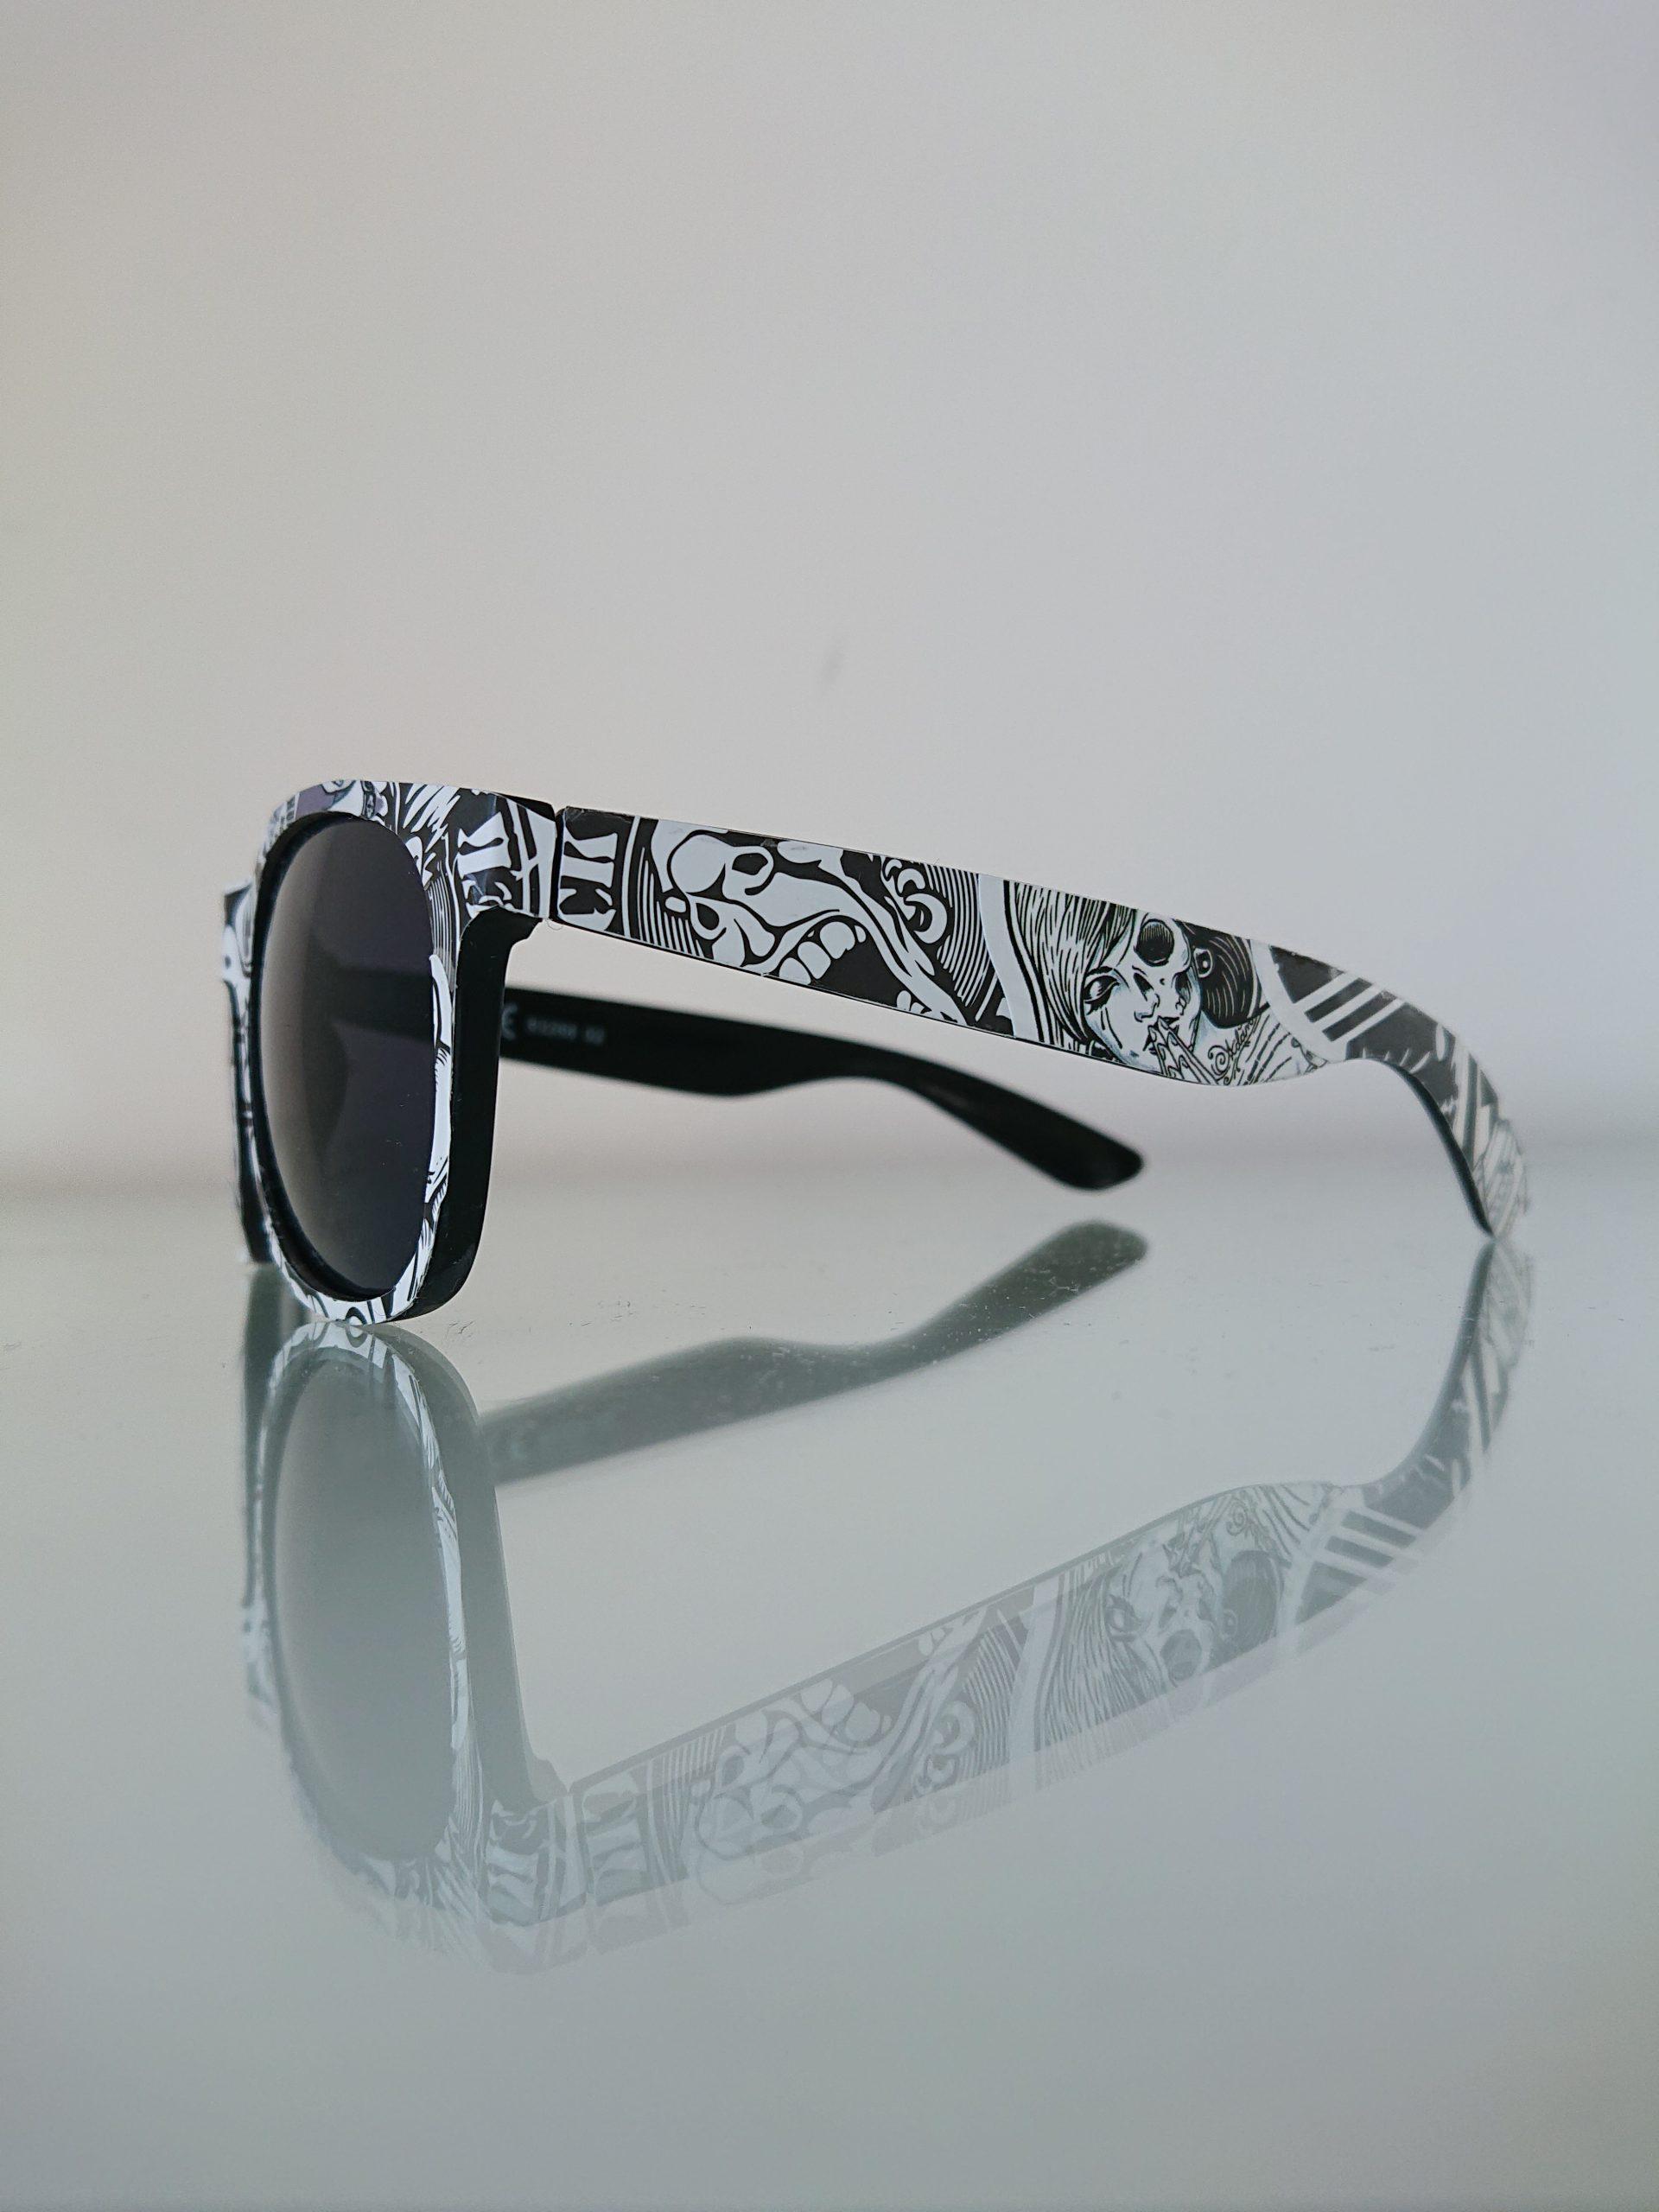 Original Sunglasses – Sticker Bombing